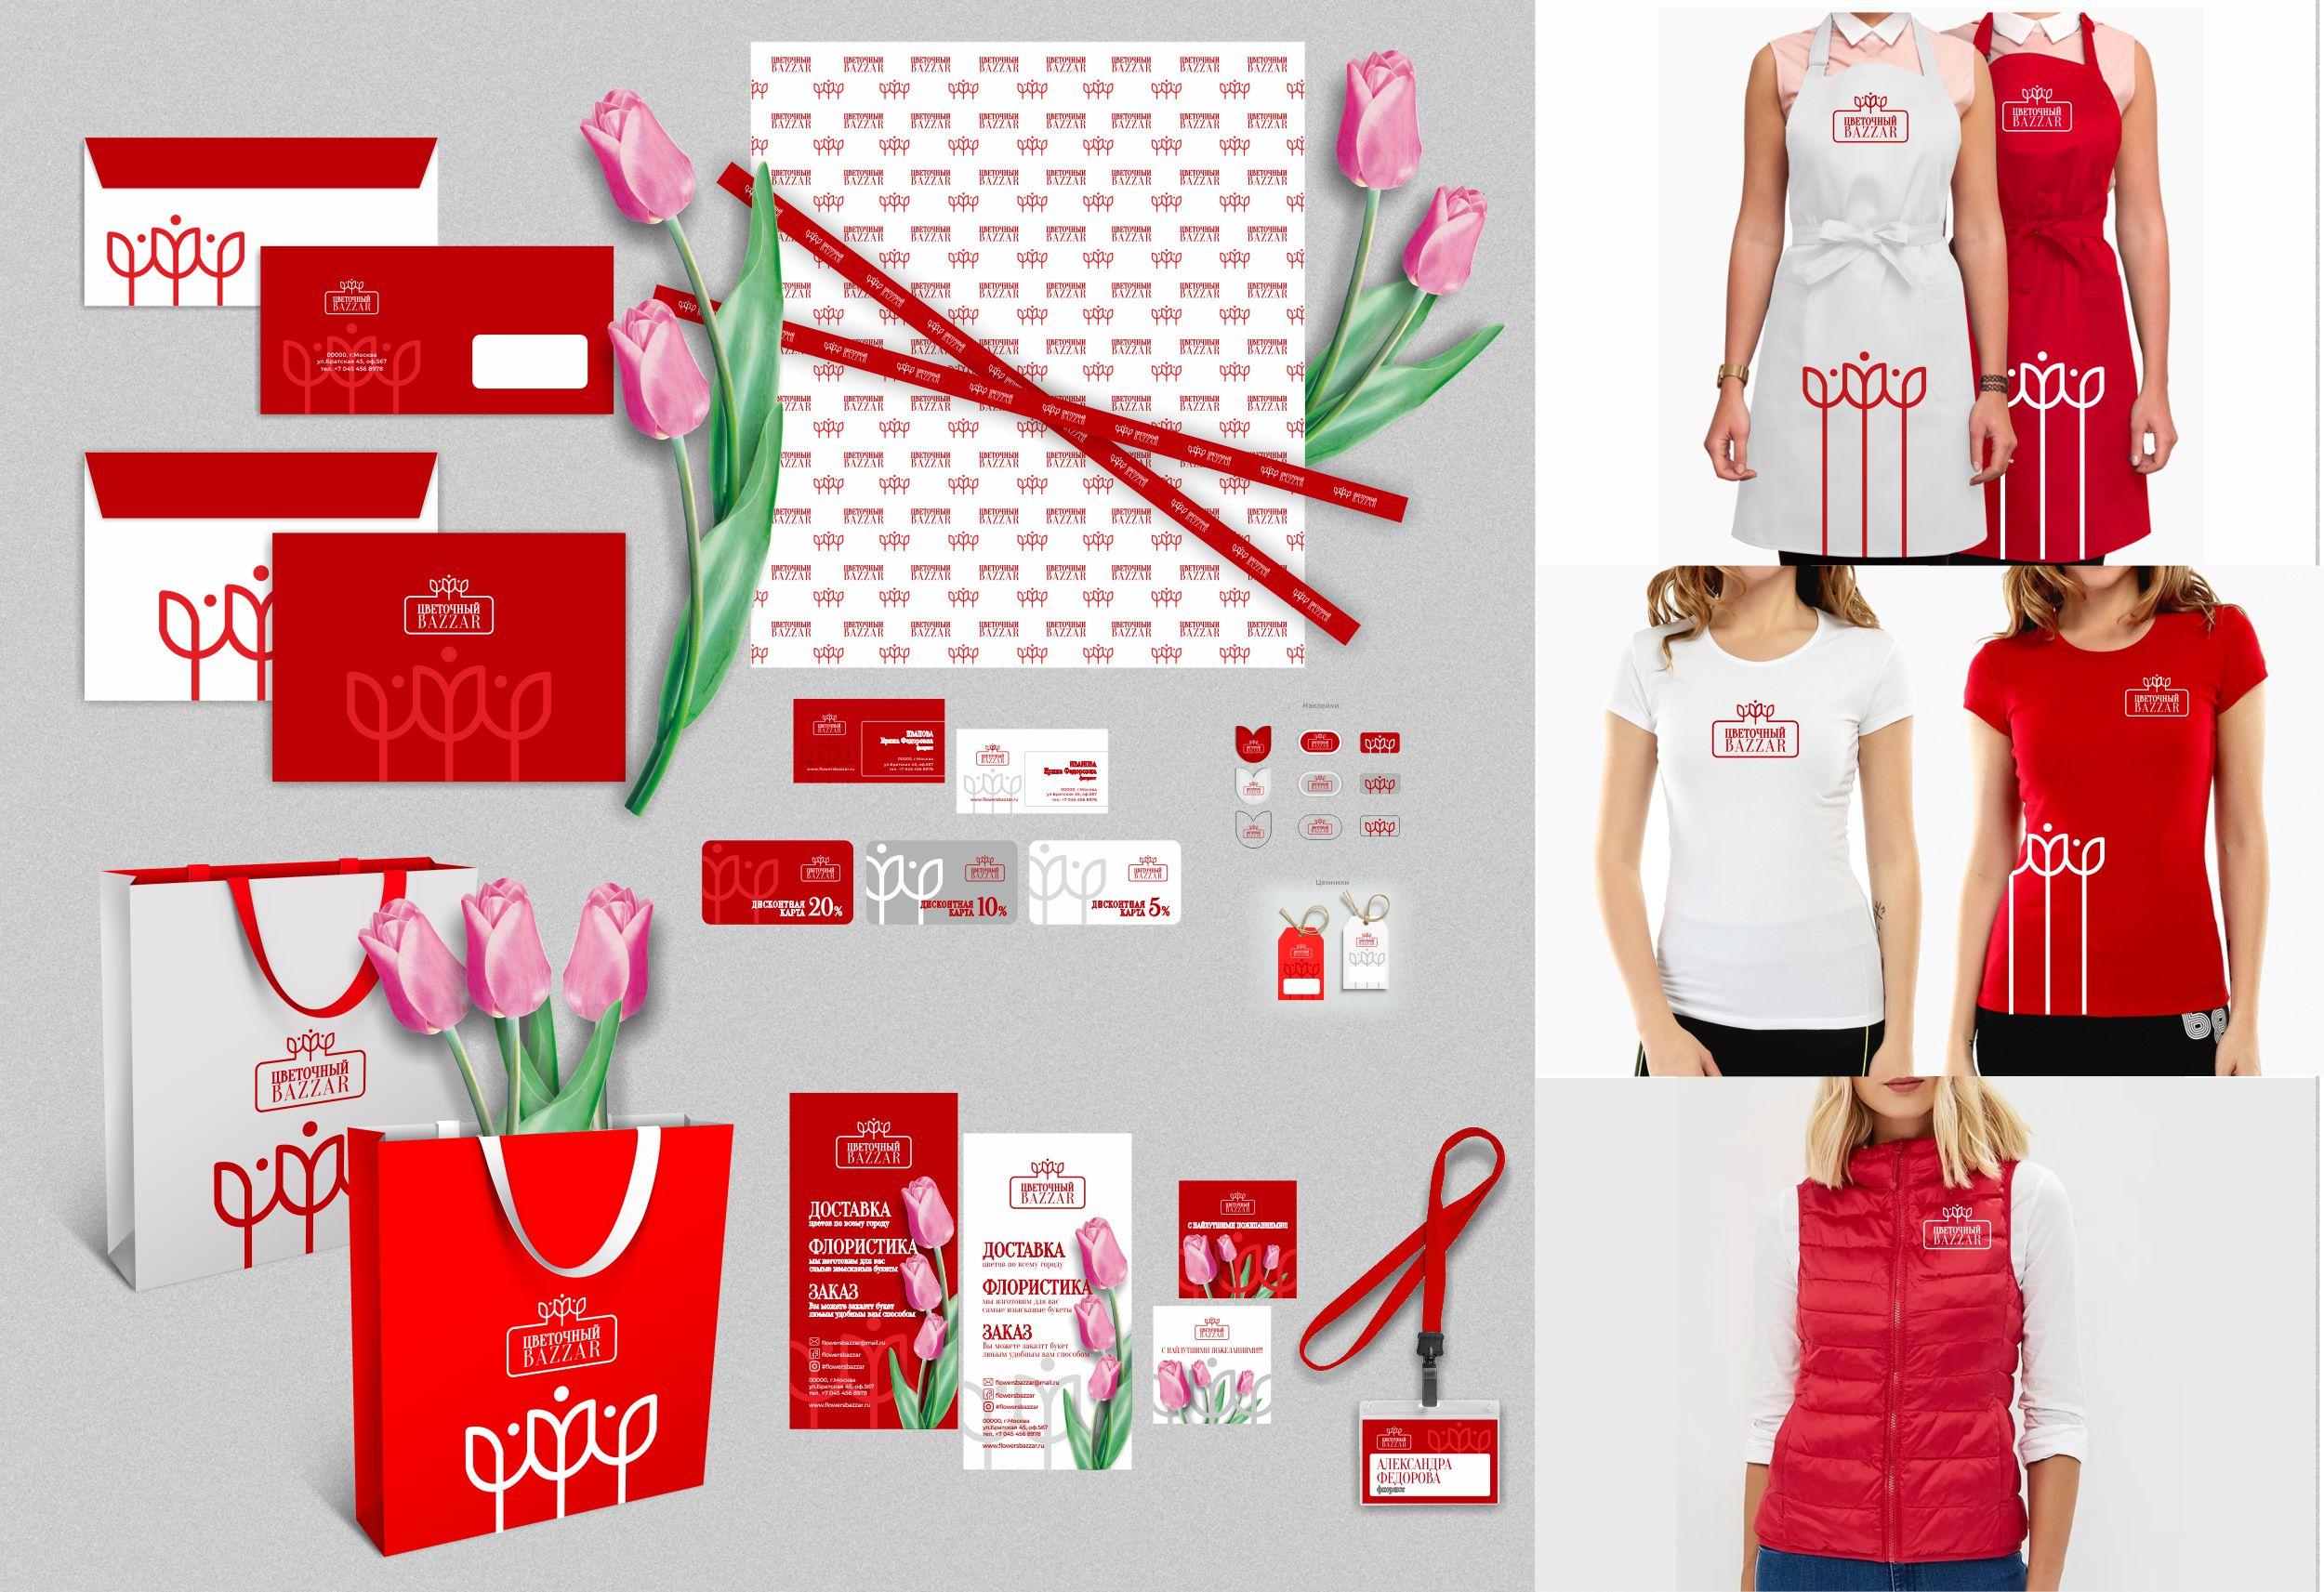 Разработка фирменного стиля для цветочного салона фото f_0535c3716800f14a.jpg